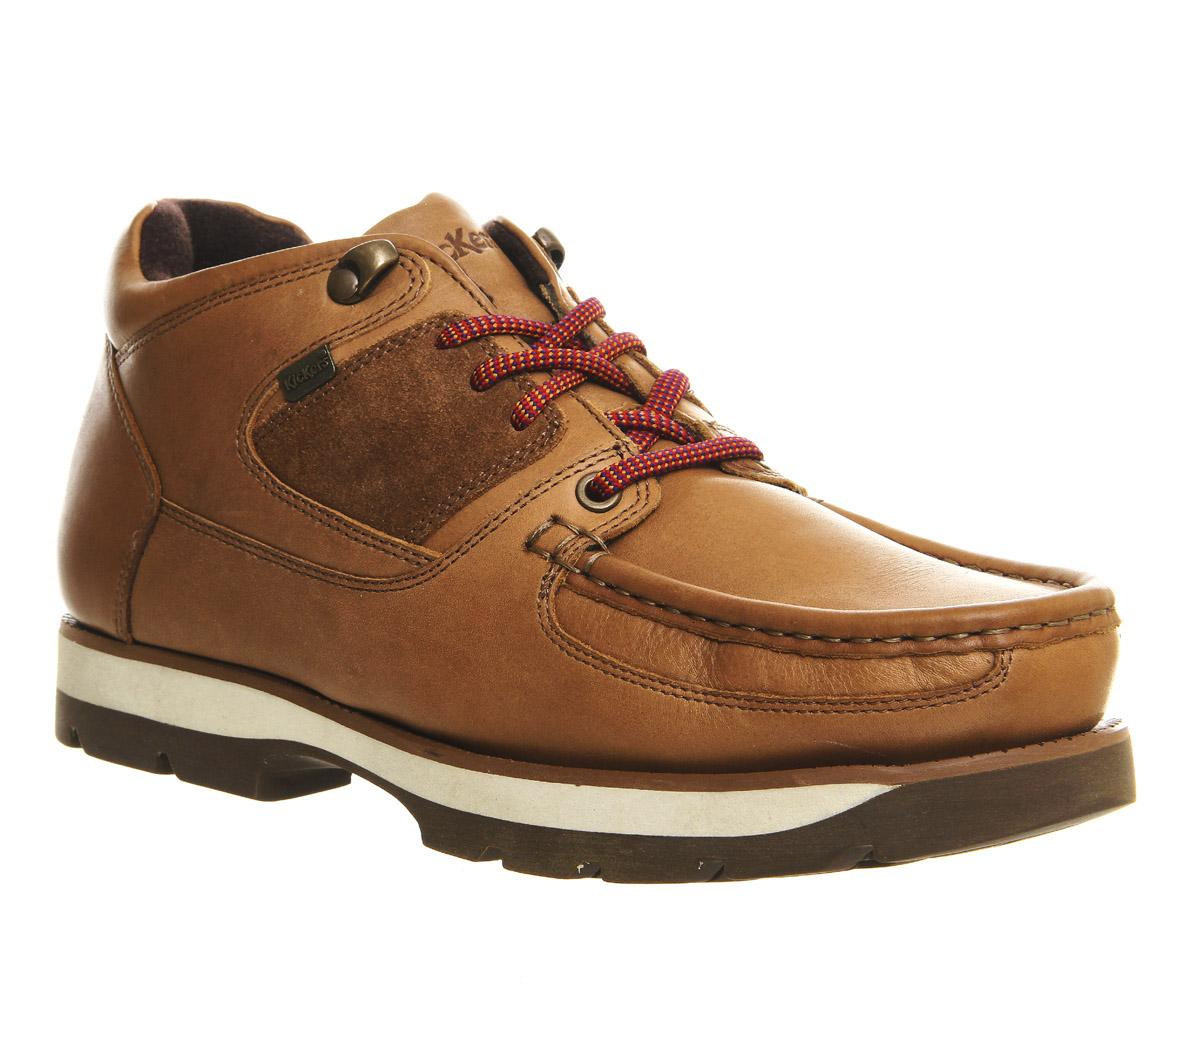 Bosley Boots